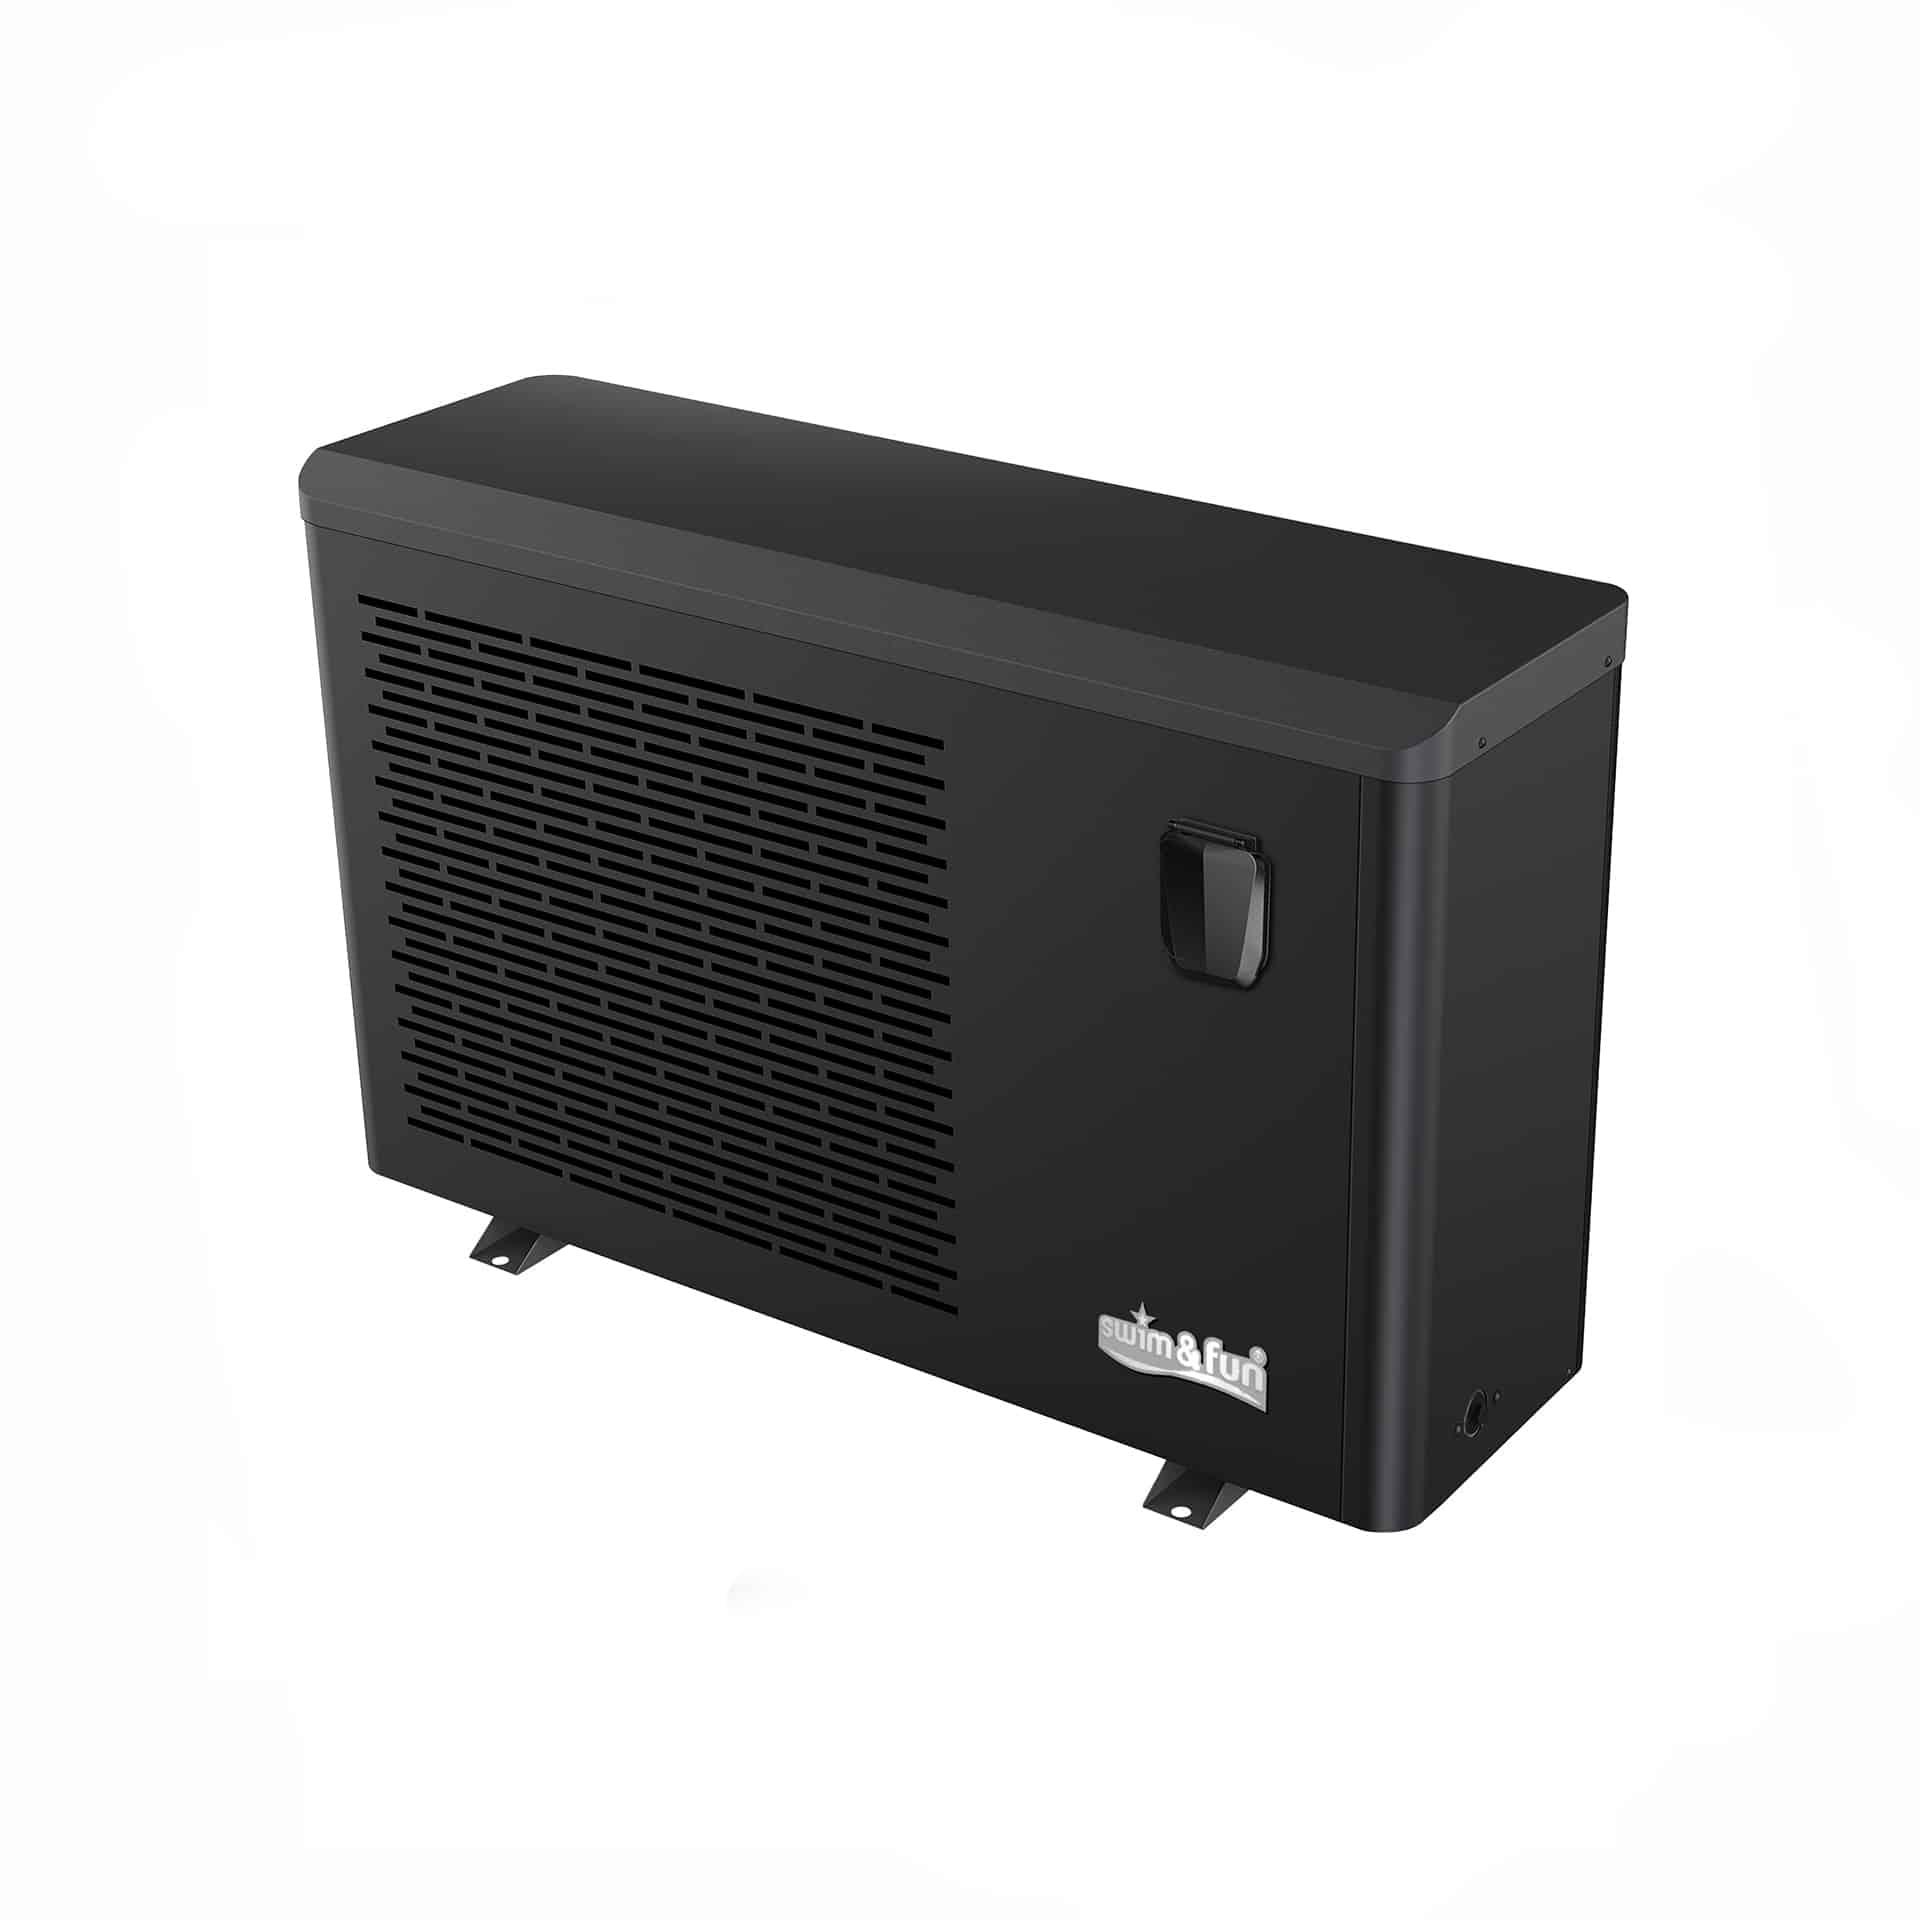 HeatBooster Pro Varmepumpe med WiFi 11 KW